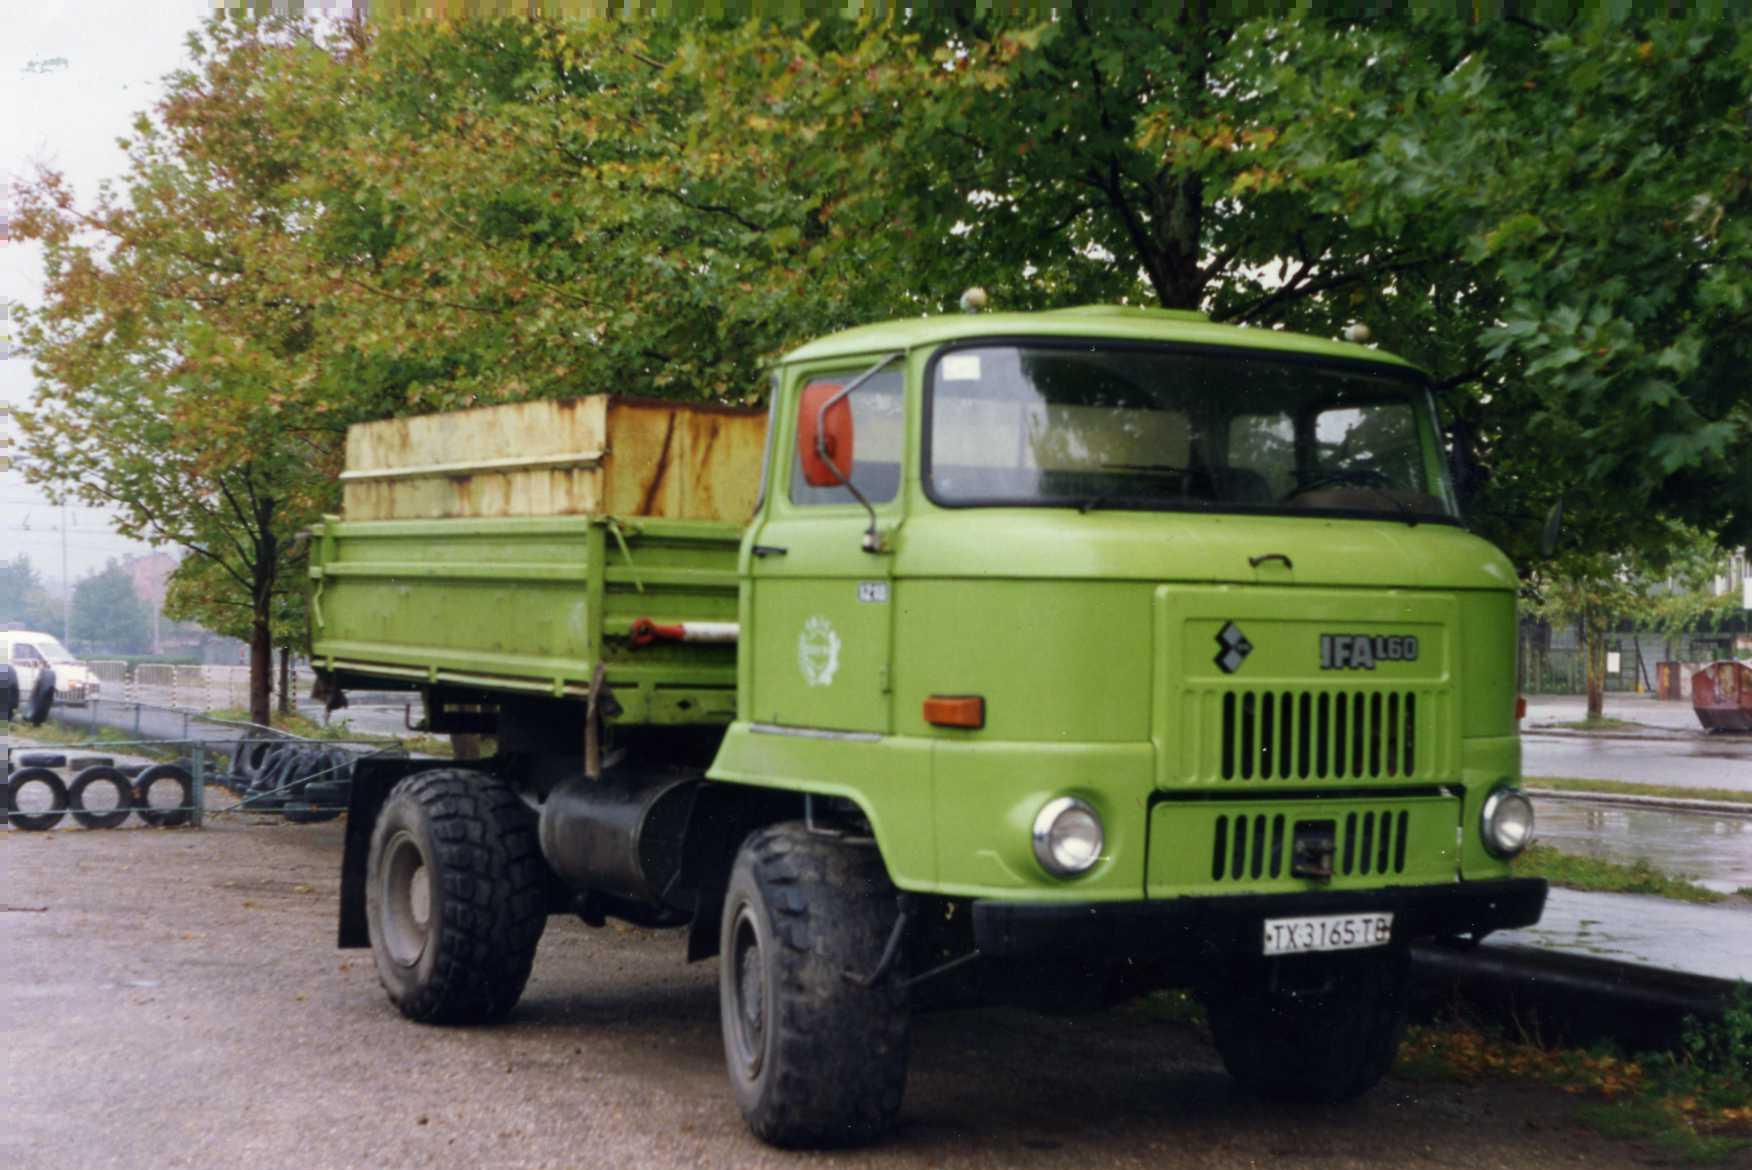 Ifa Truck Pics Hd: File:IFA L60 Truck In Dobrich, Bulgaria, October 1993.jpg